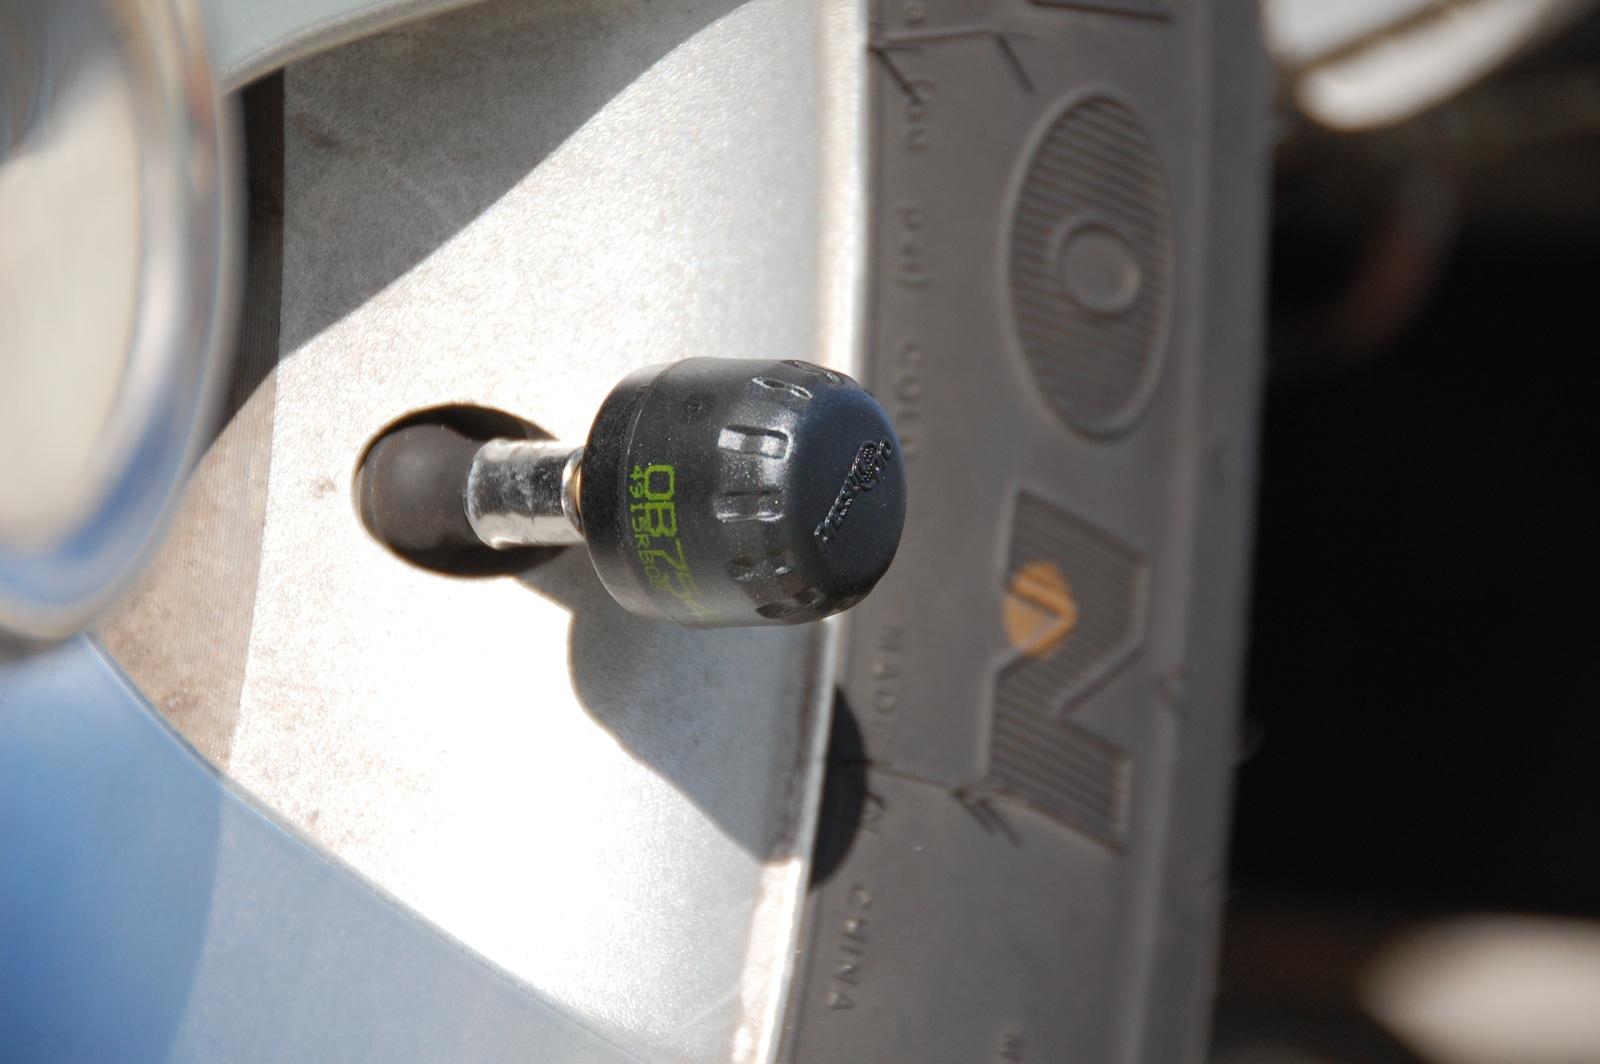 Click image for larger version  Name:DSC_0010 PressurePro sensor.jpg Views:69 Size:257.0 KB ID:256881